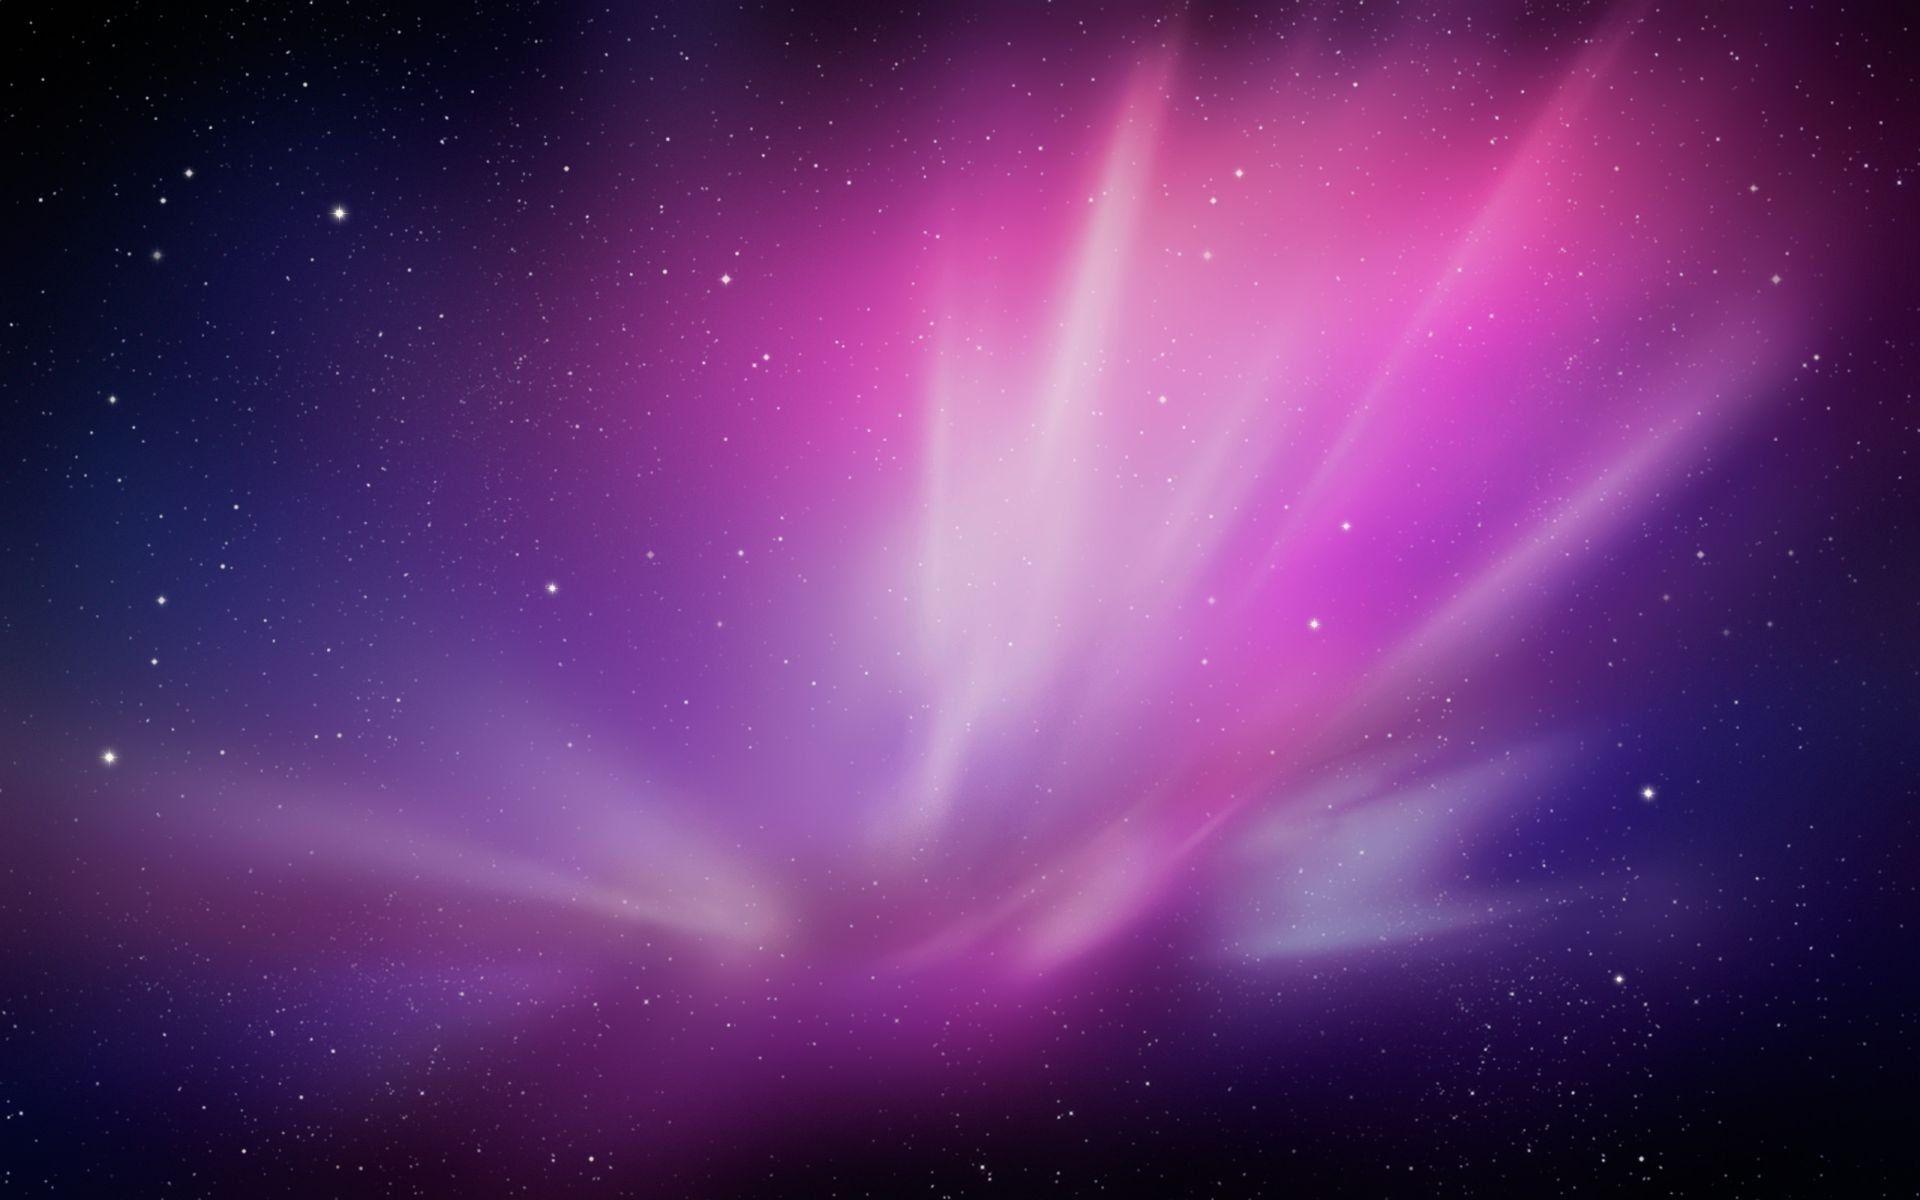 The Galaxy S4 Wallpaper I Just Pinned: Light Night Sky Star Samsung Galaxy S Wallpapers HD 1000